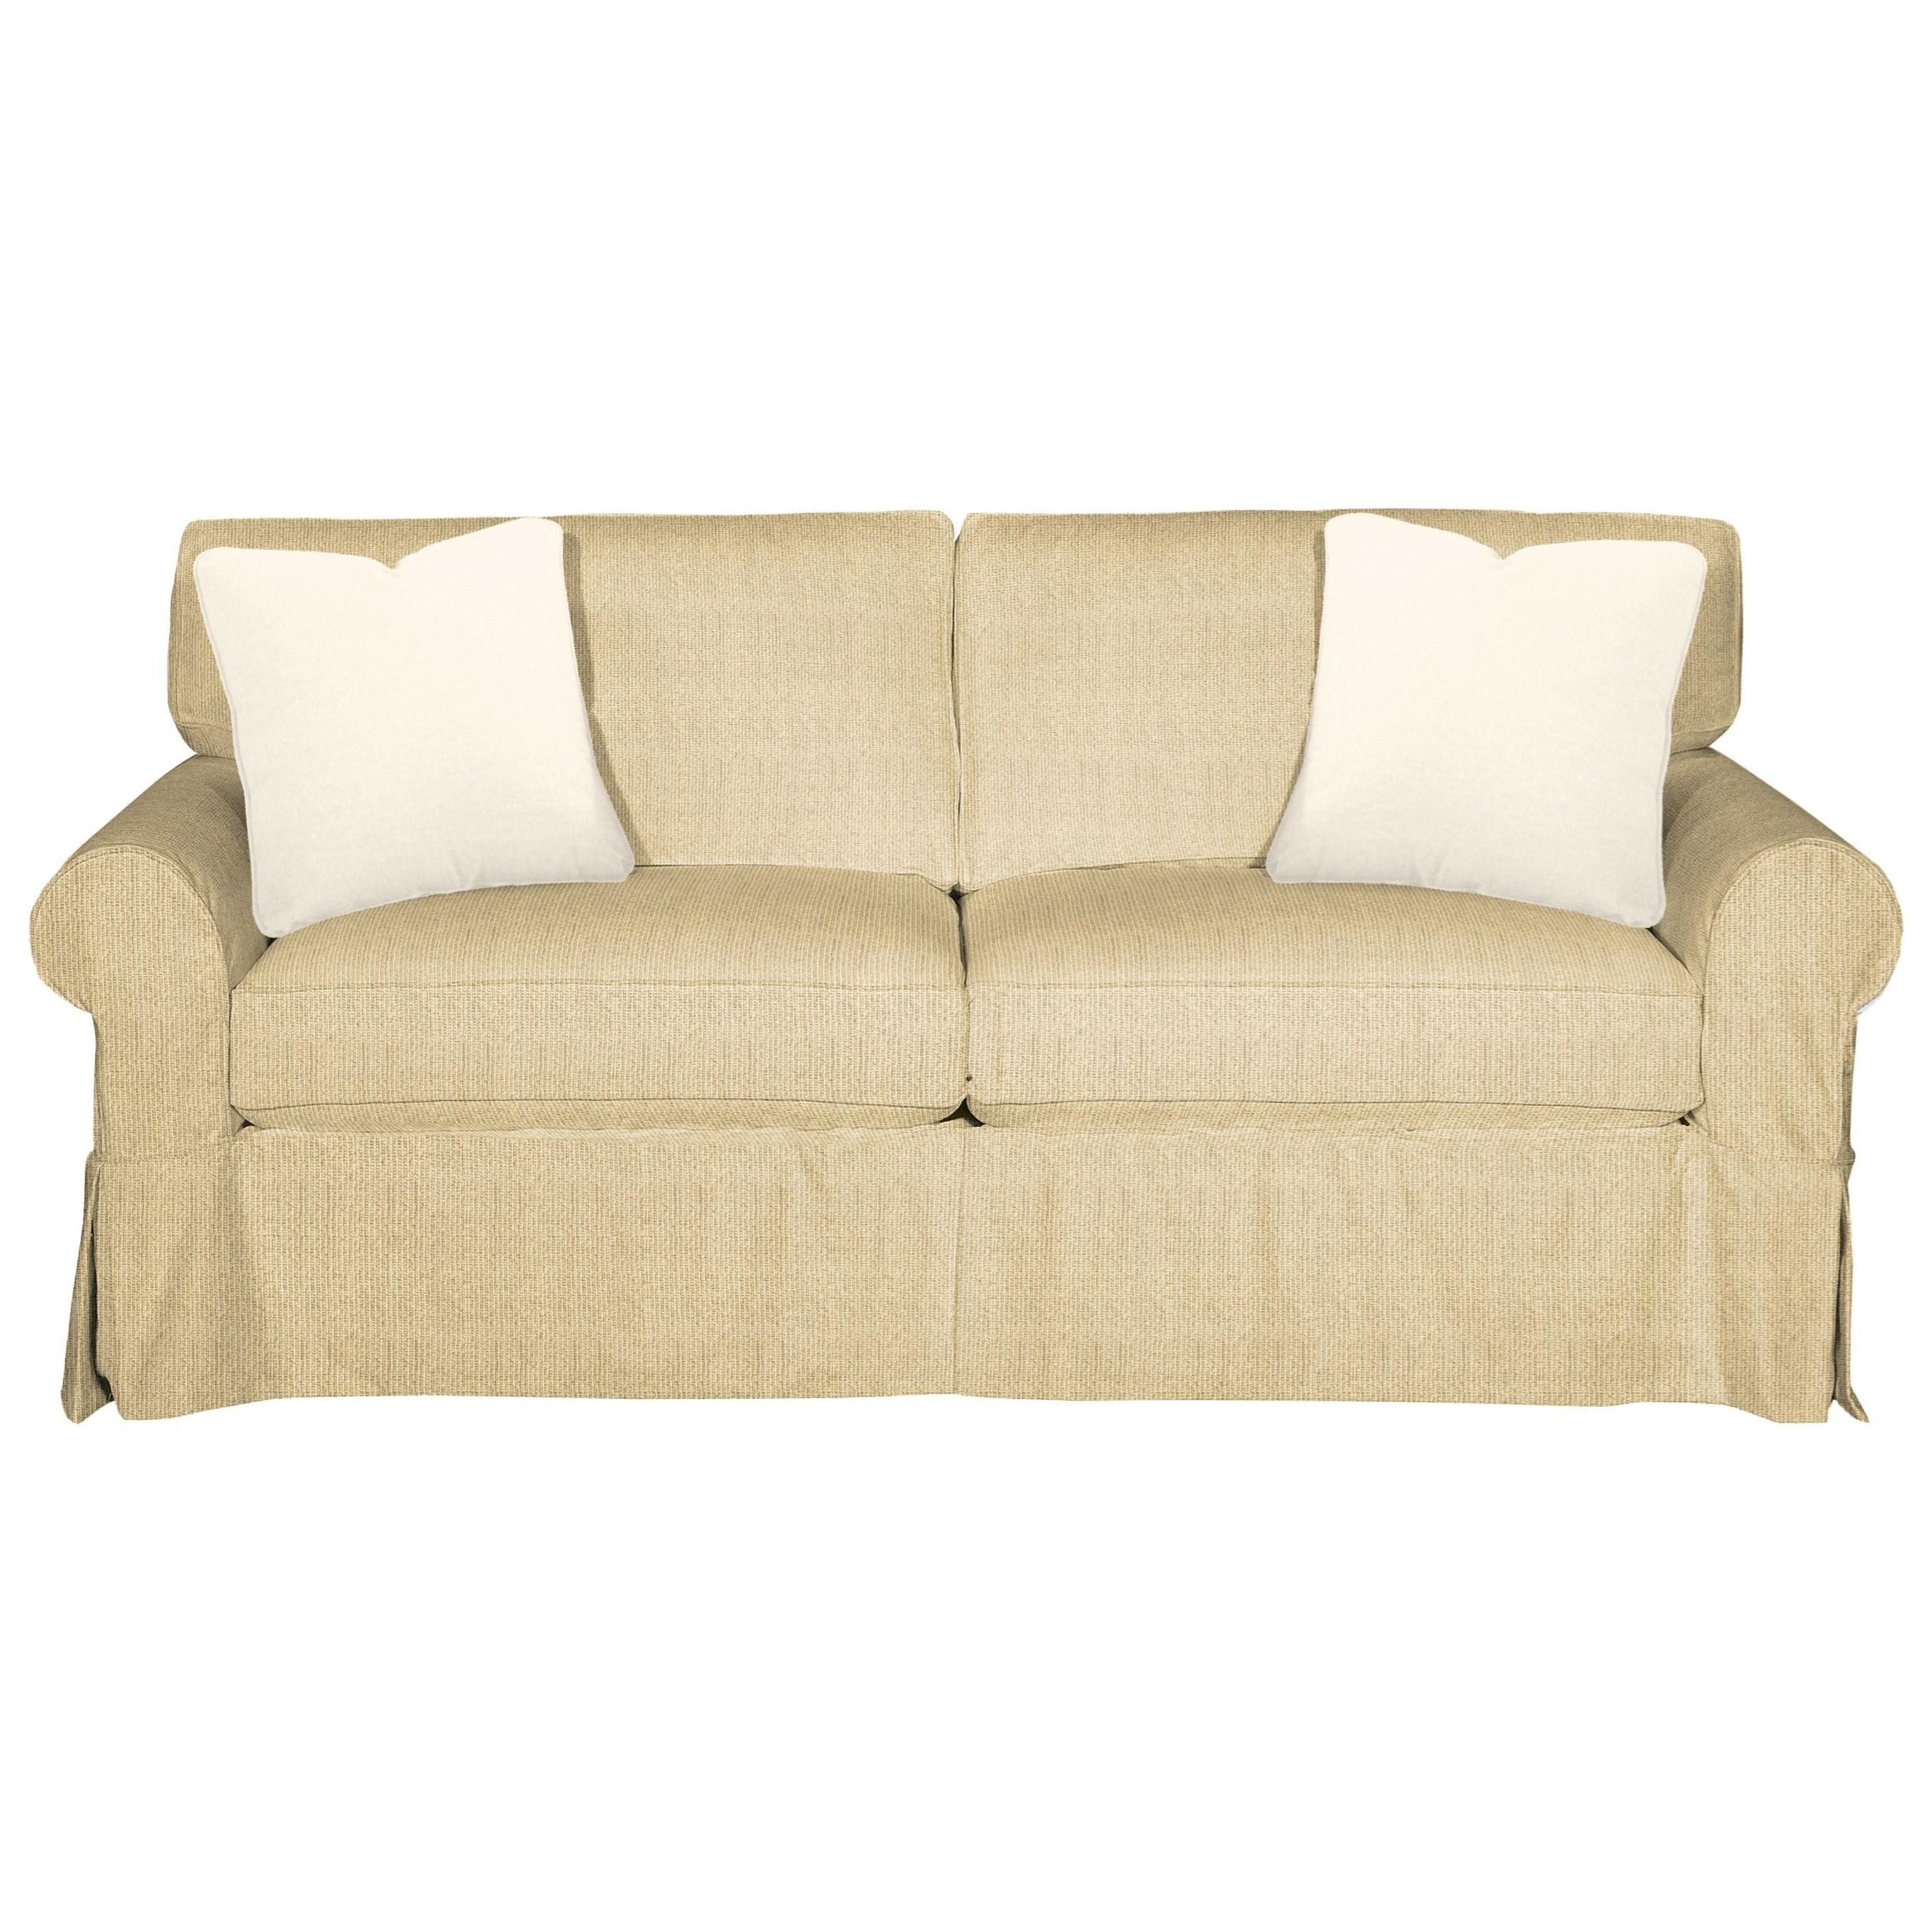 9228 Sleeper Sofa w/ Innerspring Mattress by Craftmaster at Goods Furniture